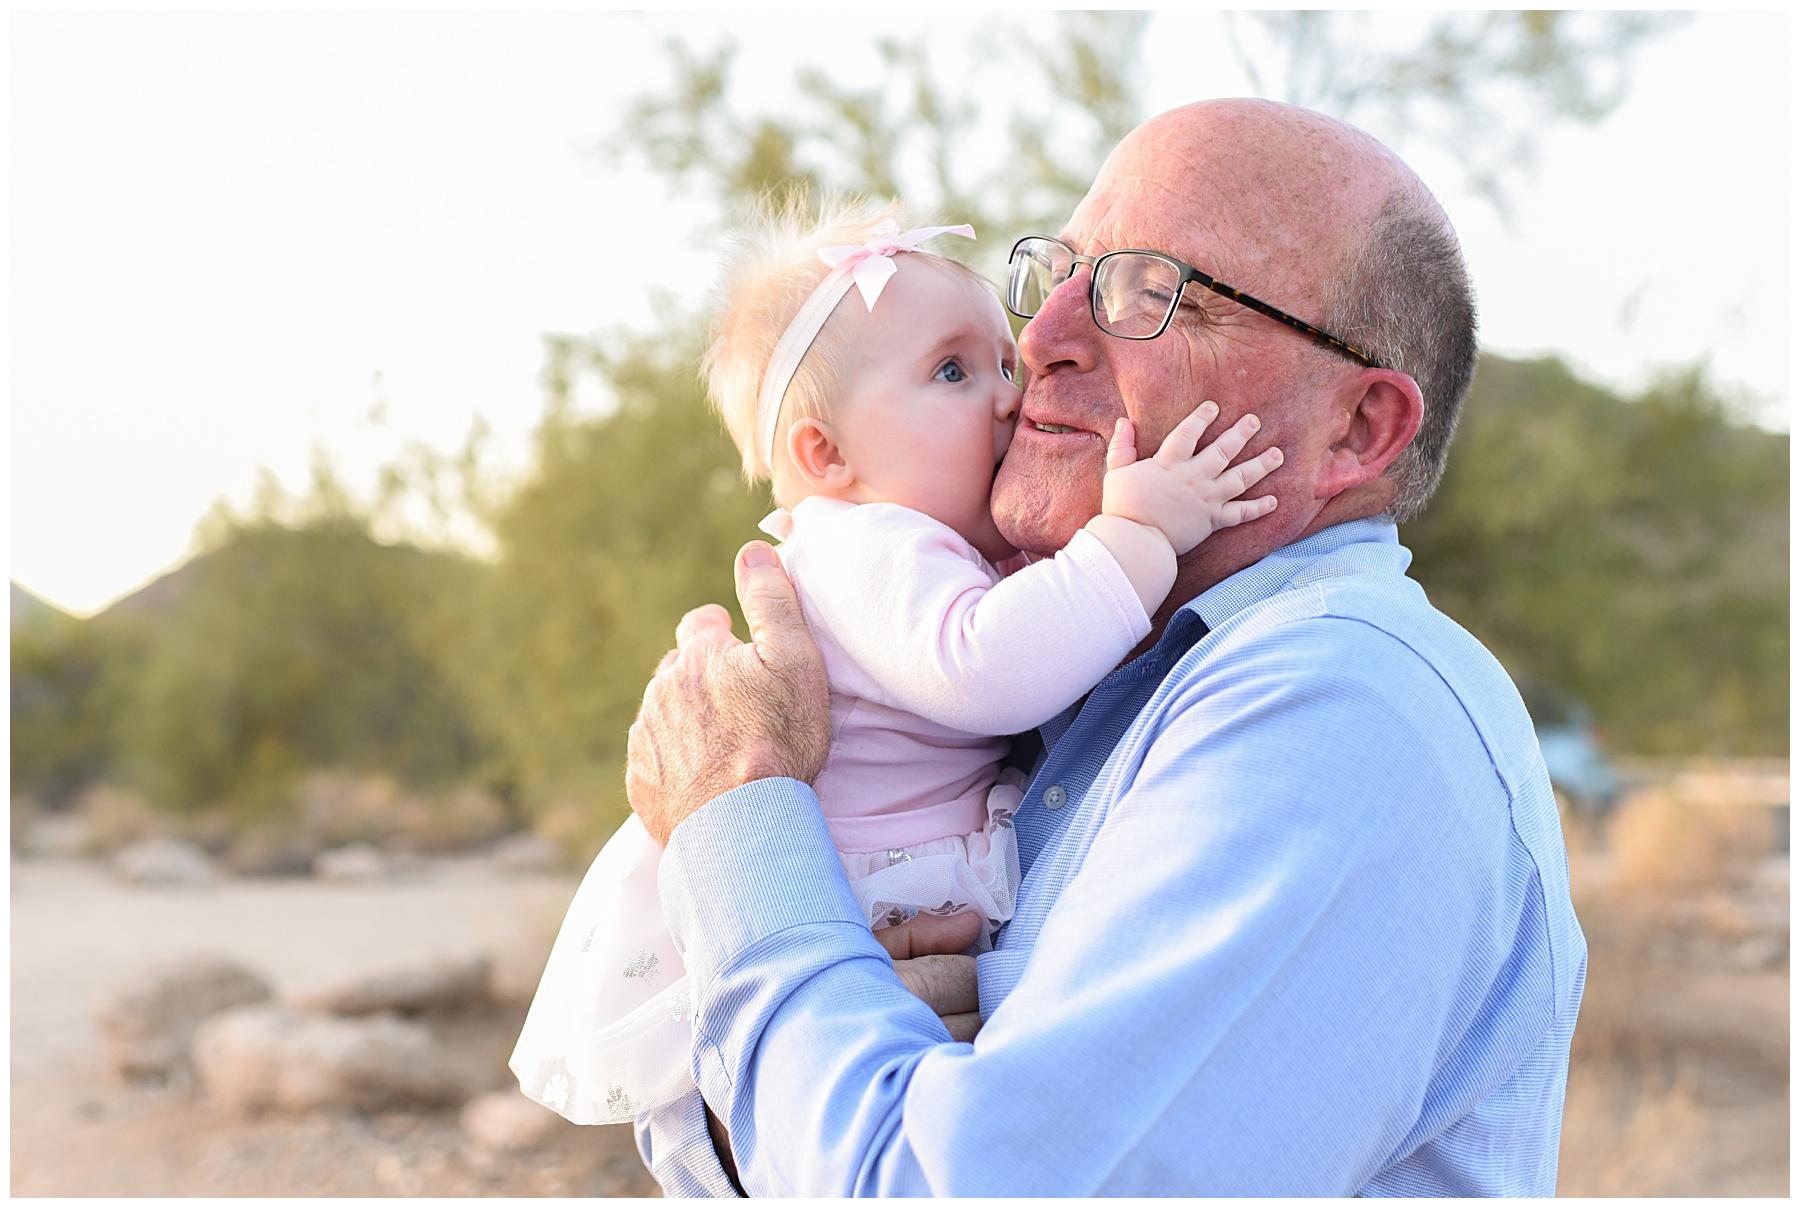 Grandpa kiss | Sweetlife Photography